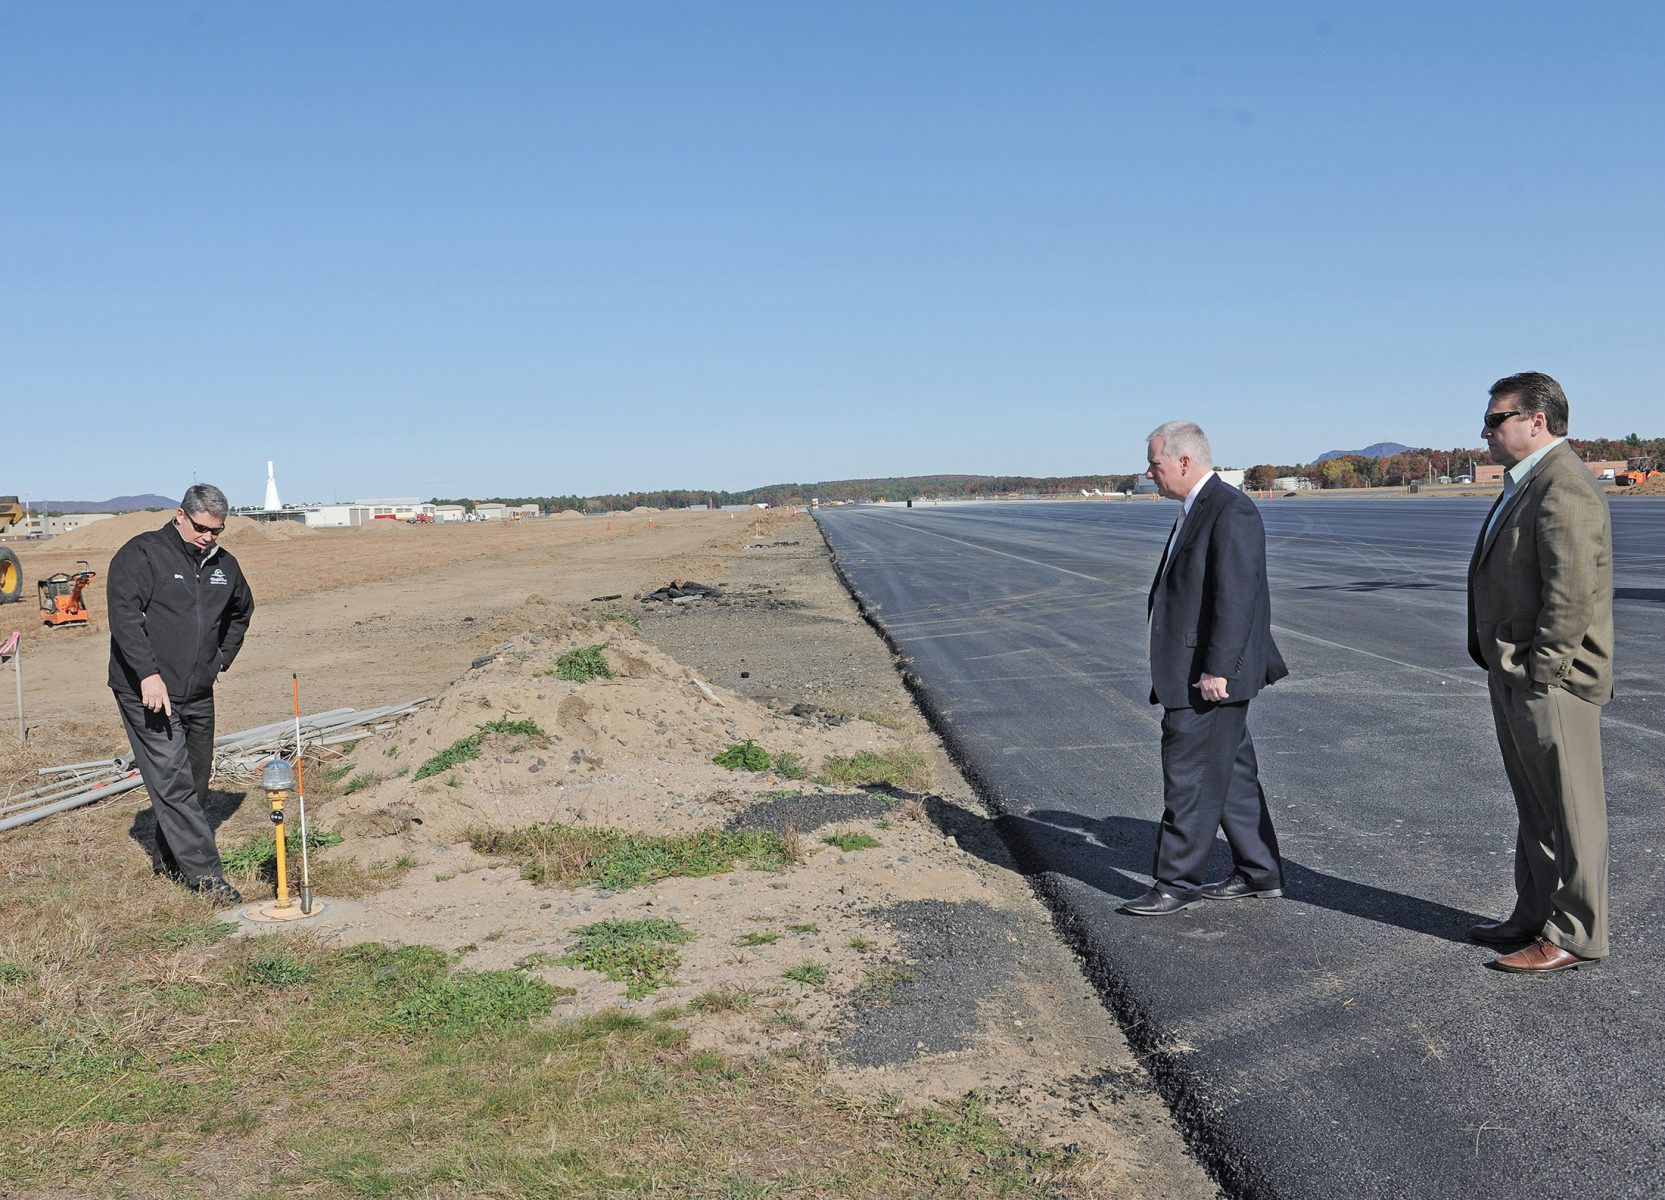 Runway scheduled to reopen | The Westfield News |October ...